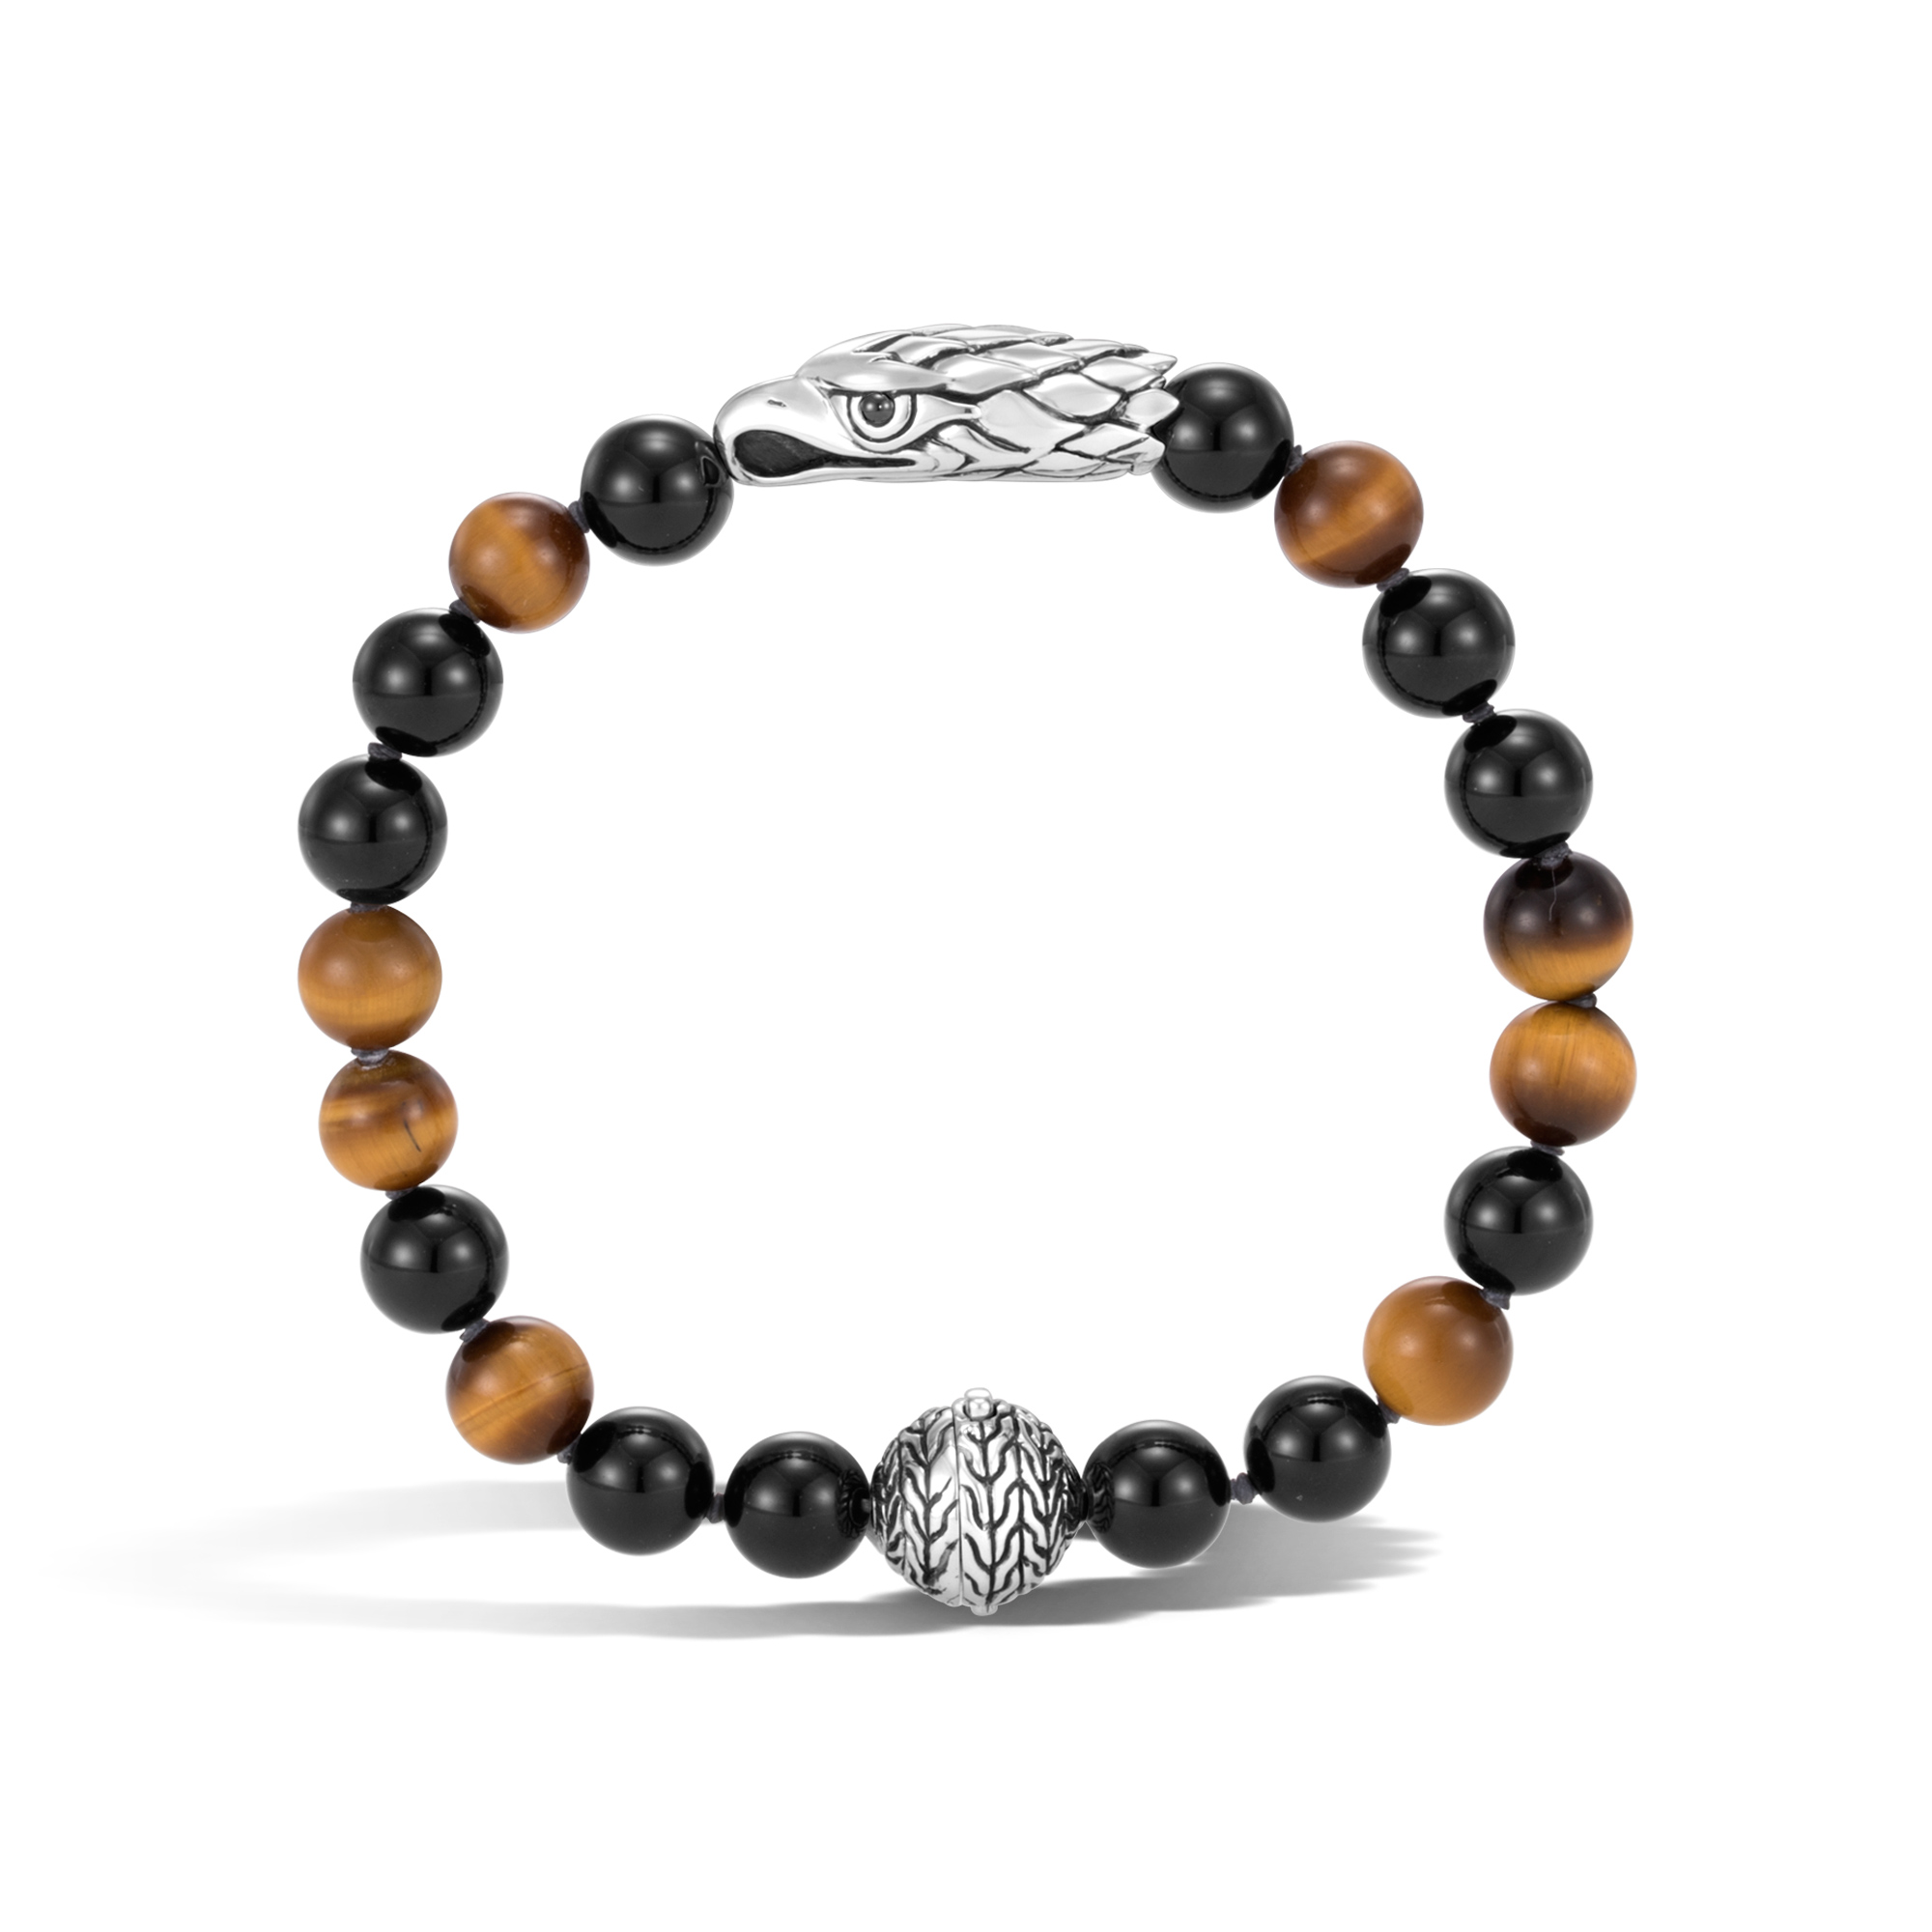 Legends Eagle Bead Bracelet in Silver with Gemstone, Brown Tiger Eye, large